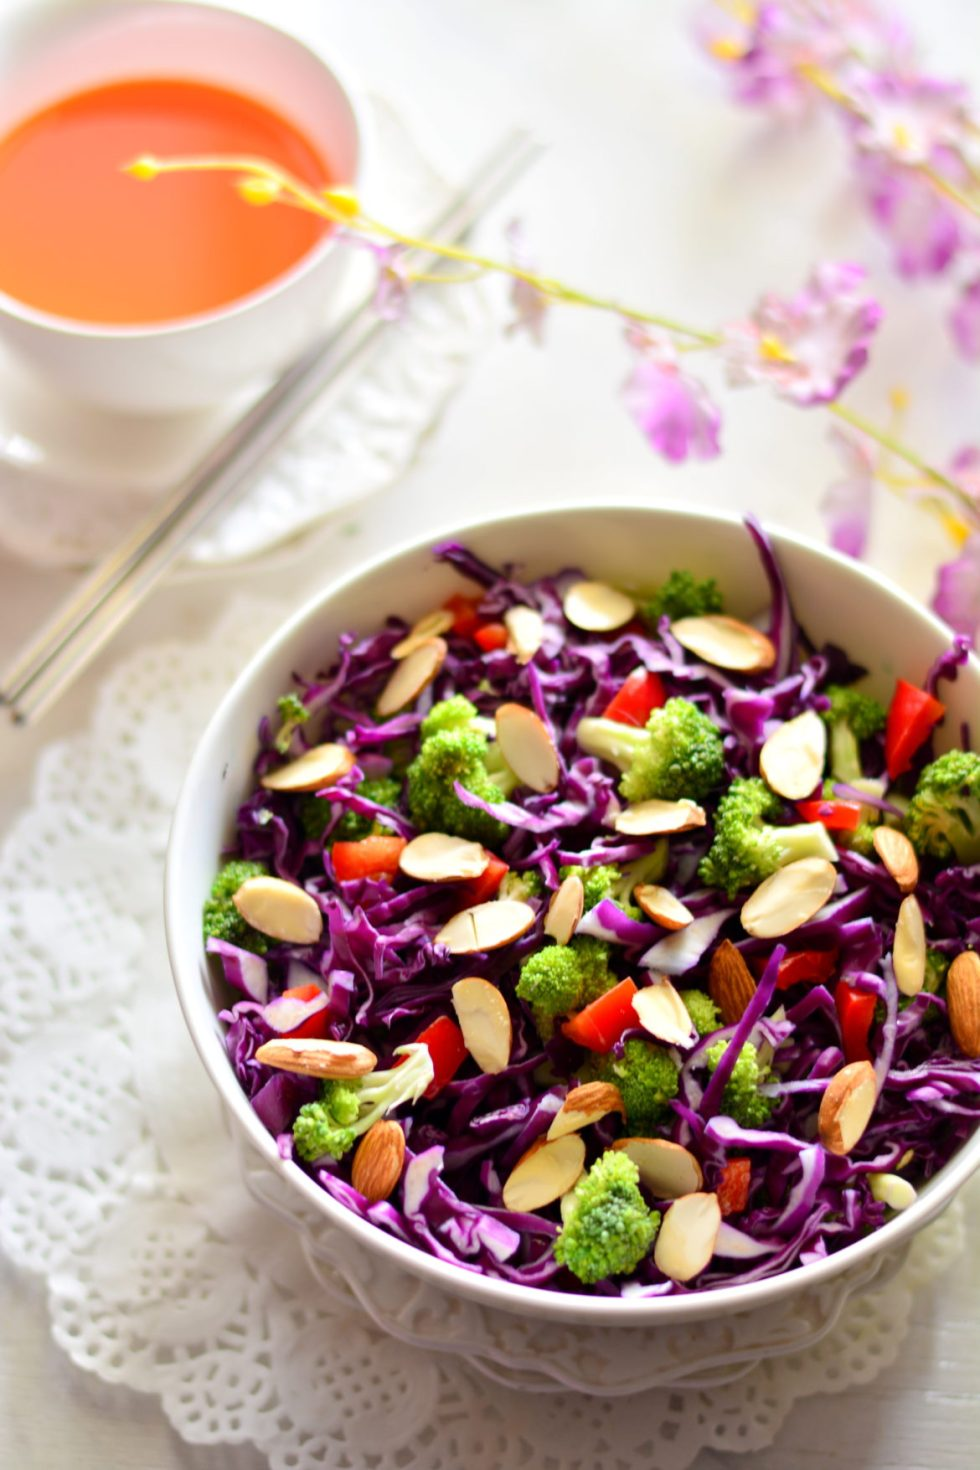 Purple Cabbage & Broccoli Salad with Miso Orange & Almond Dressing